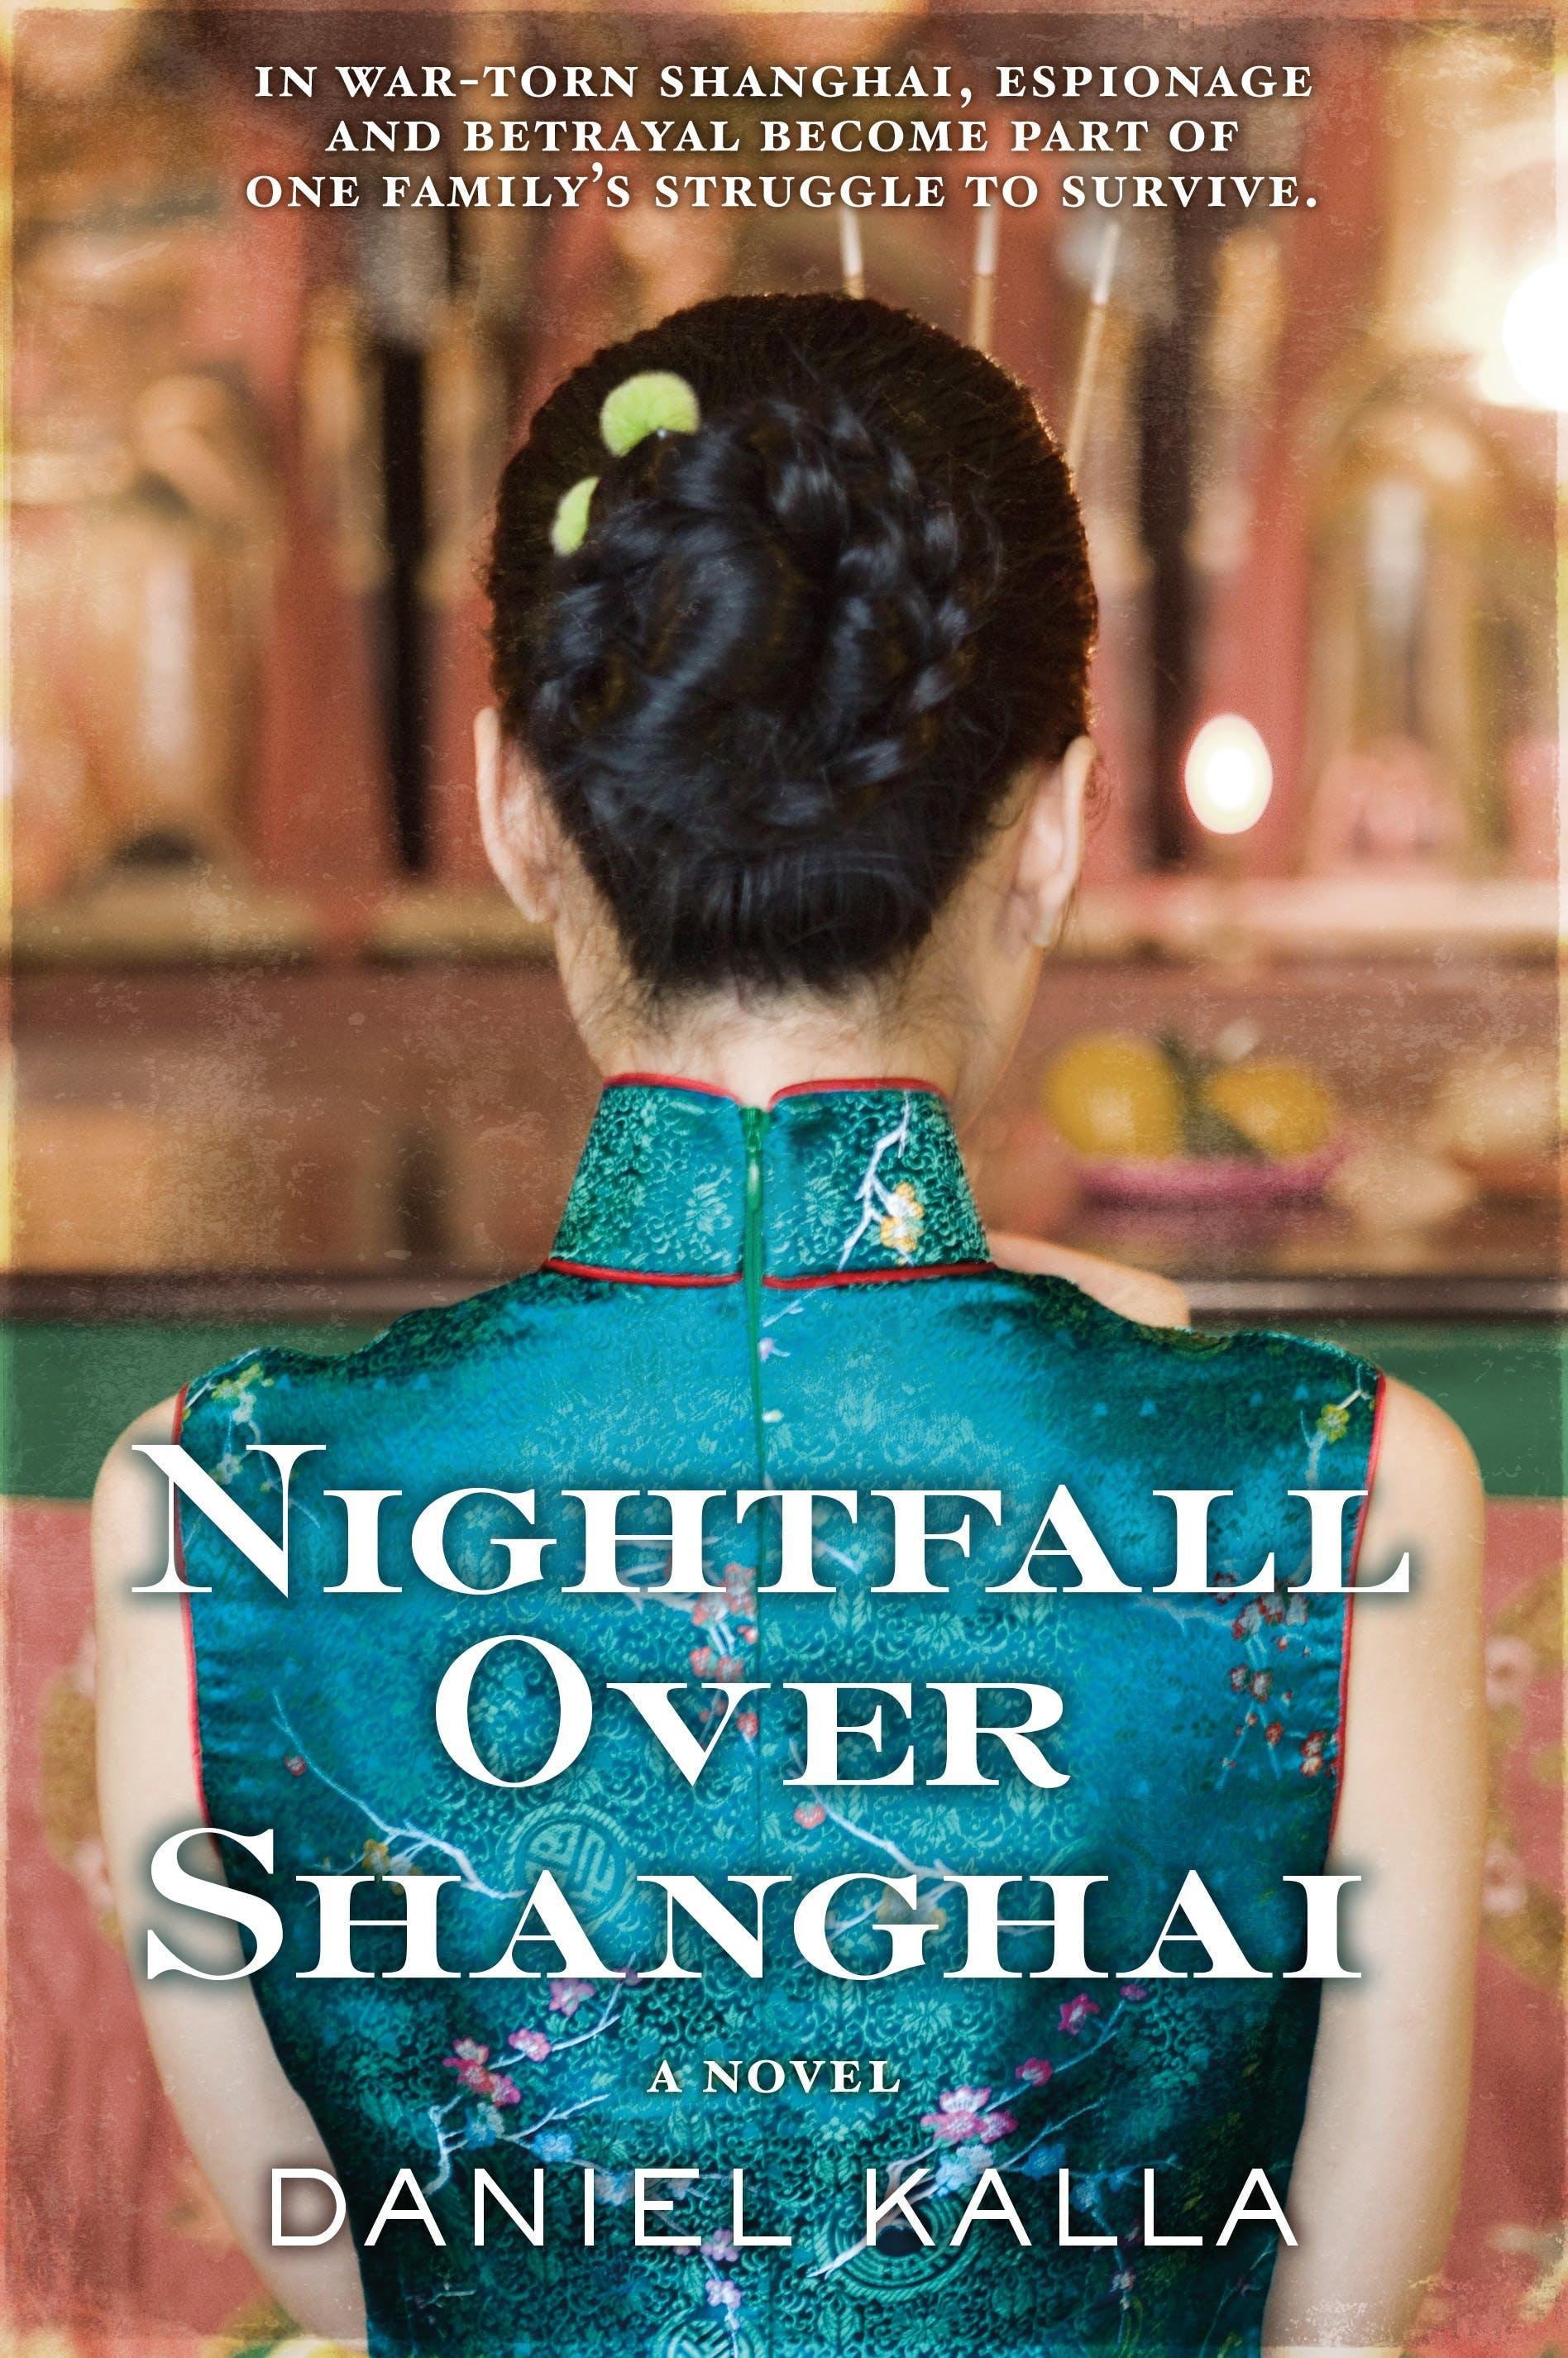 Image of Nightfall Over Shanghai